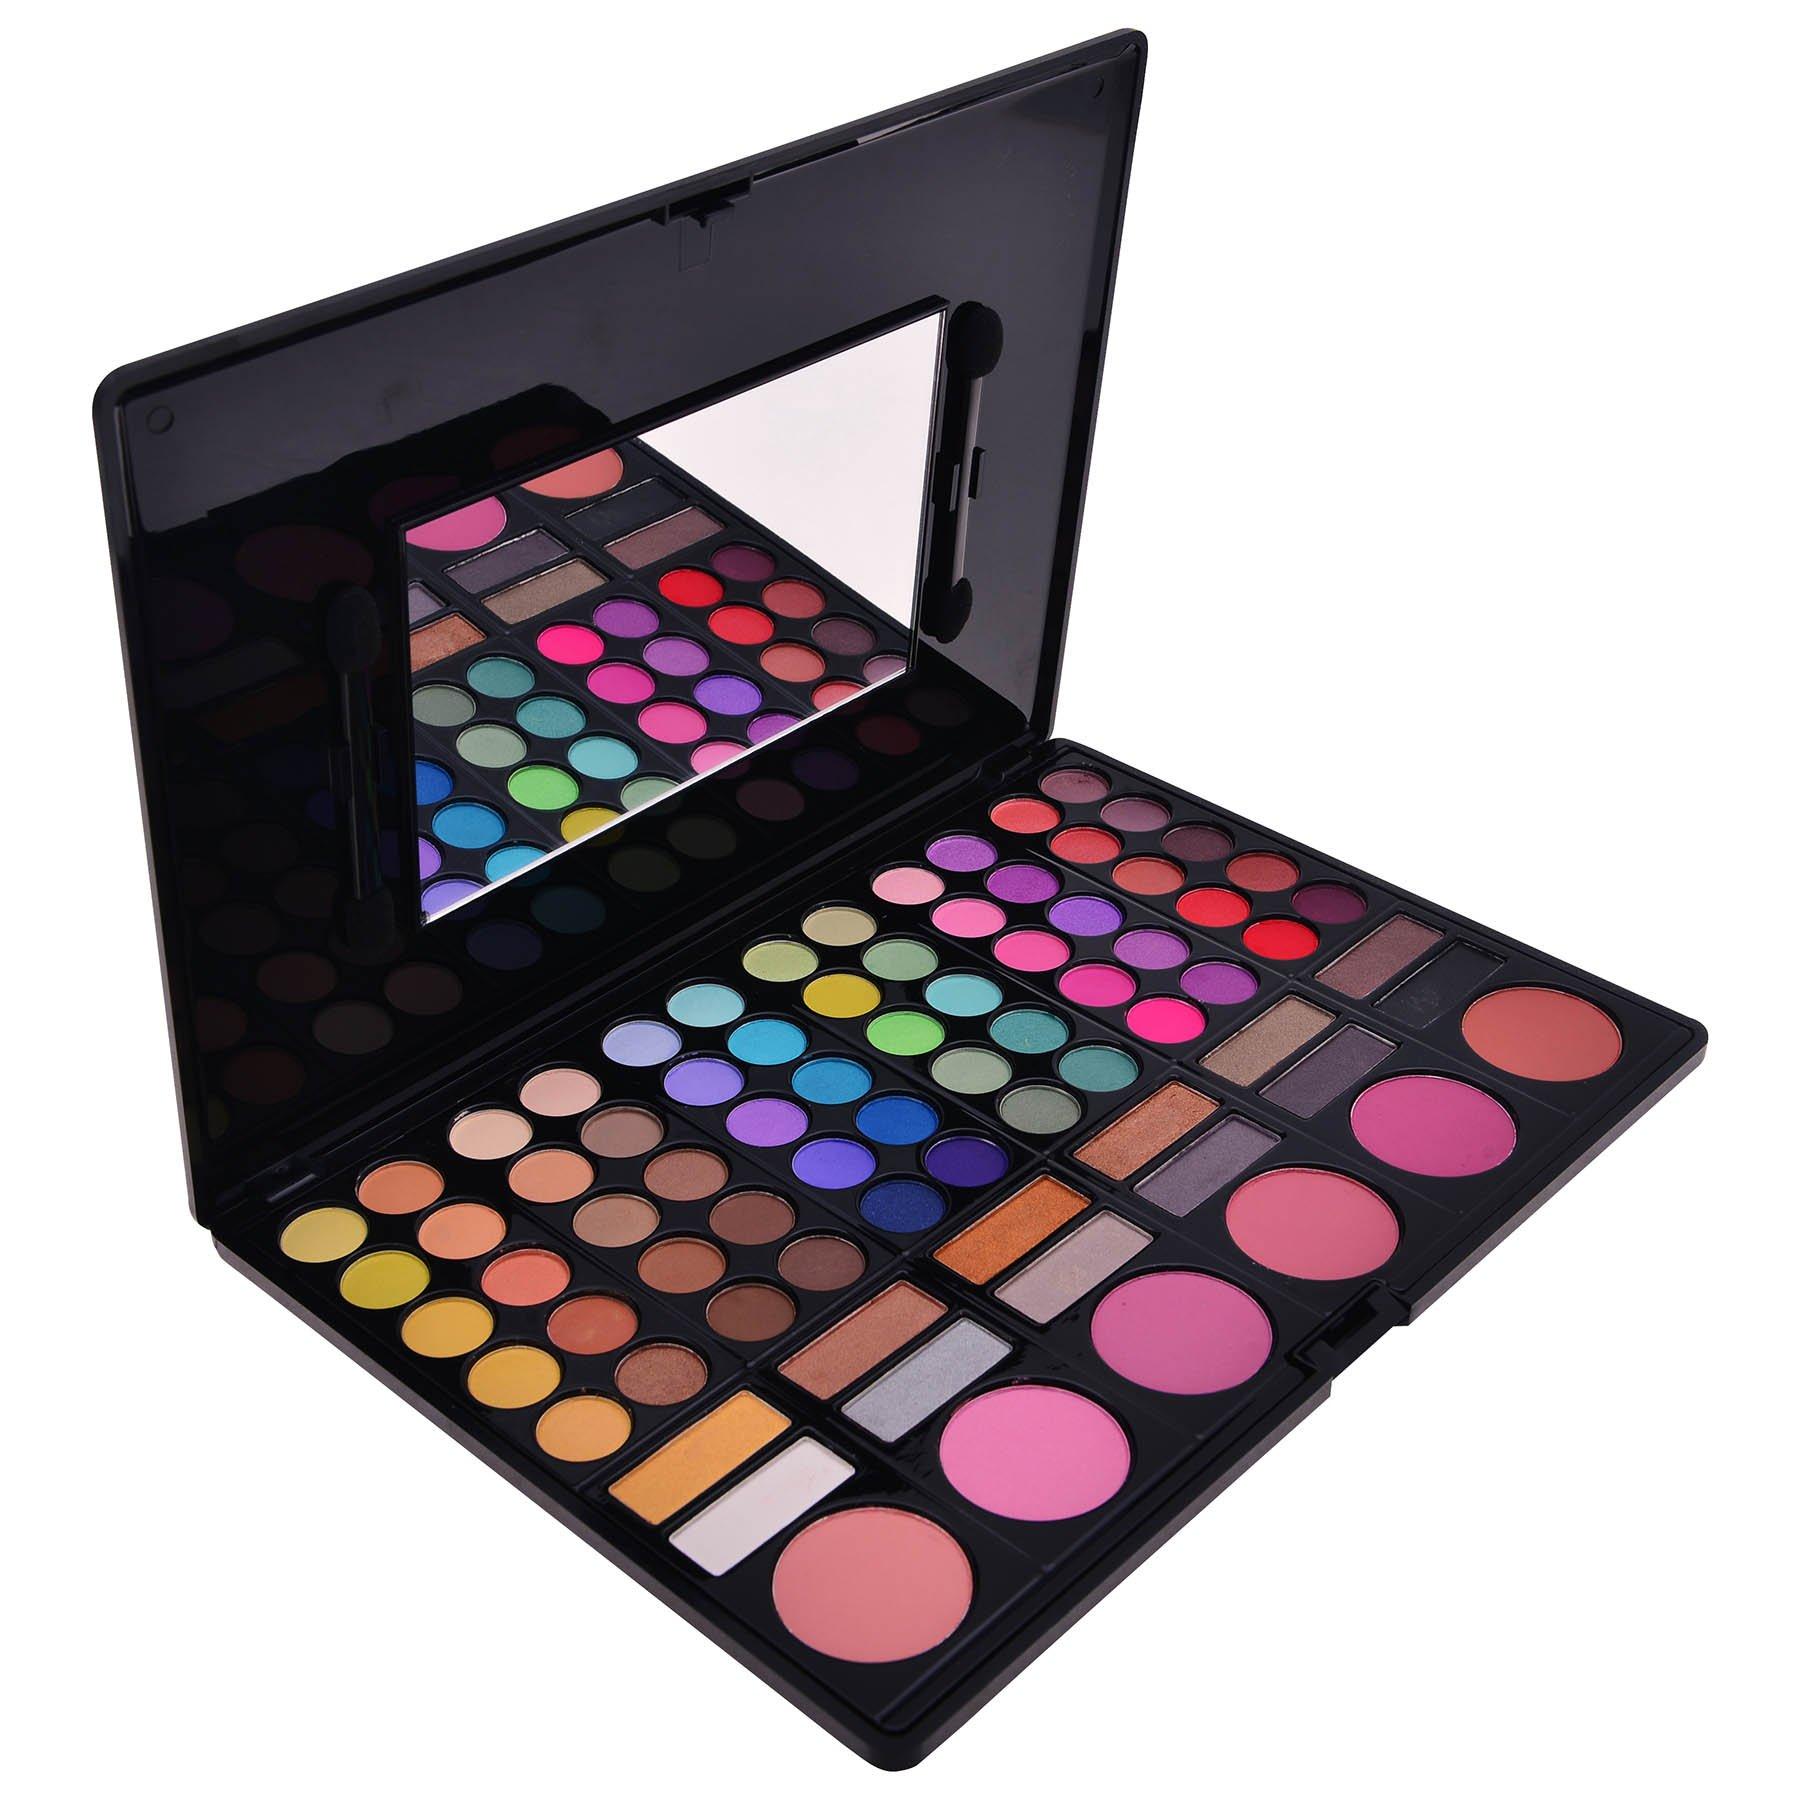 SHANY Cosmetics SHANY Natural Fusion Eyeshadow Palette 88